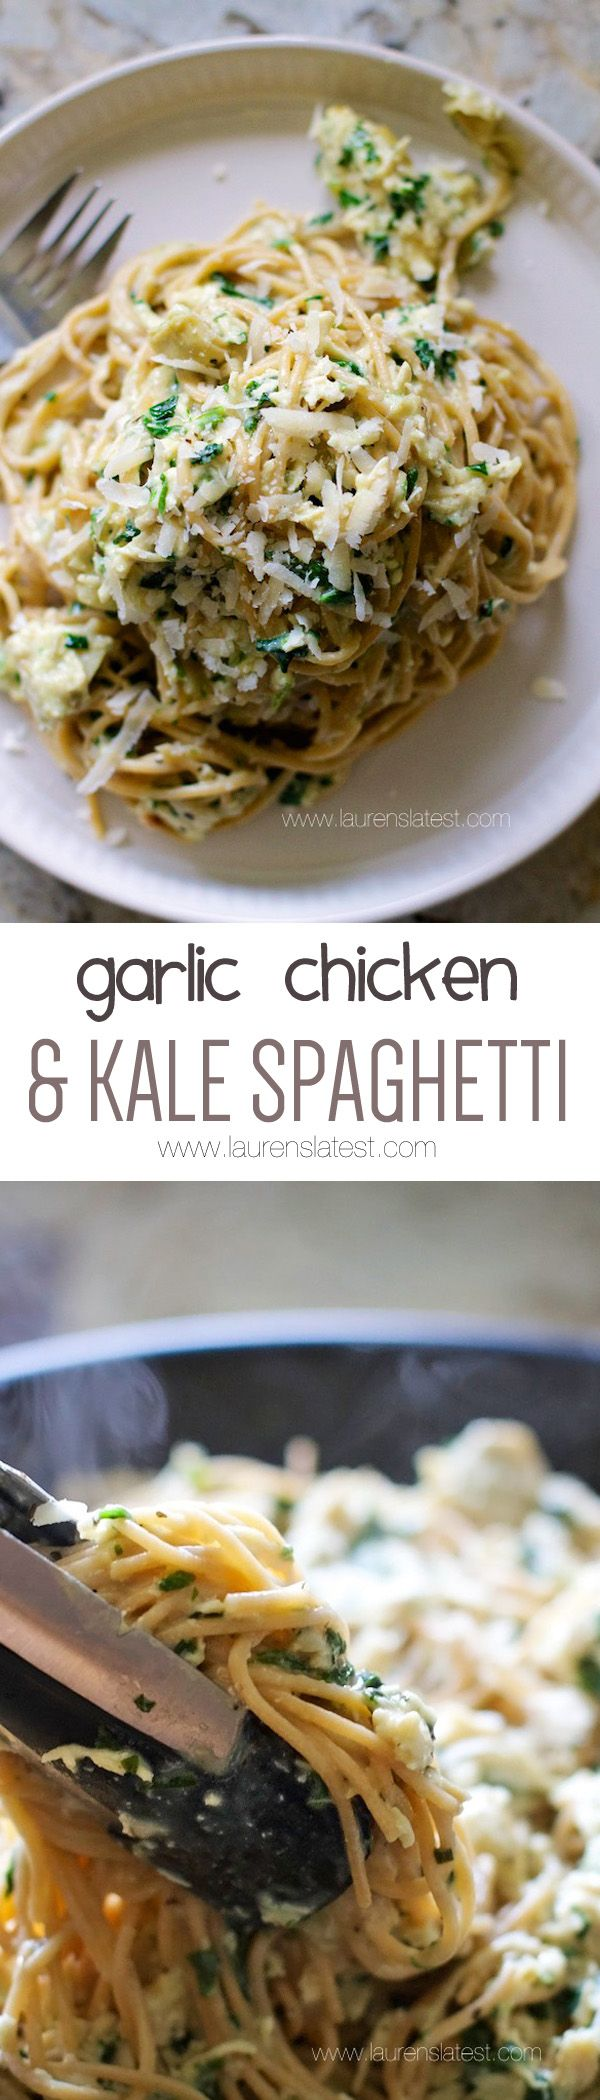 Garlic Chicken & Kale Spaghetti I can use gluten free noodles by laurenslatest #Chicken #Kale #Pasta